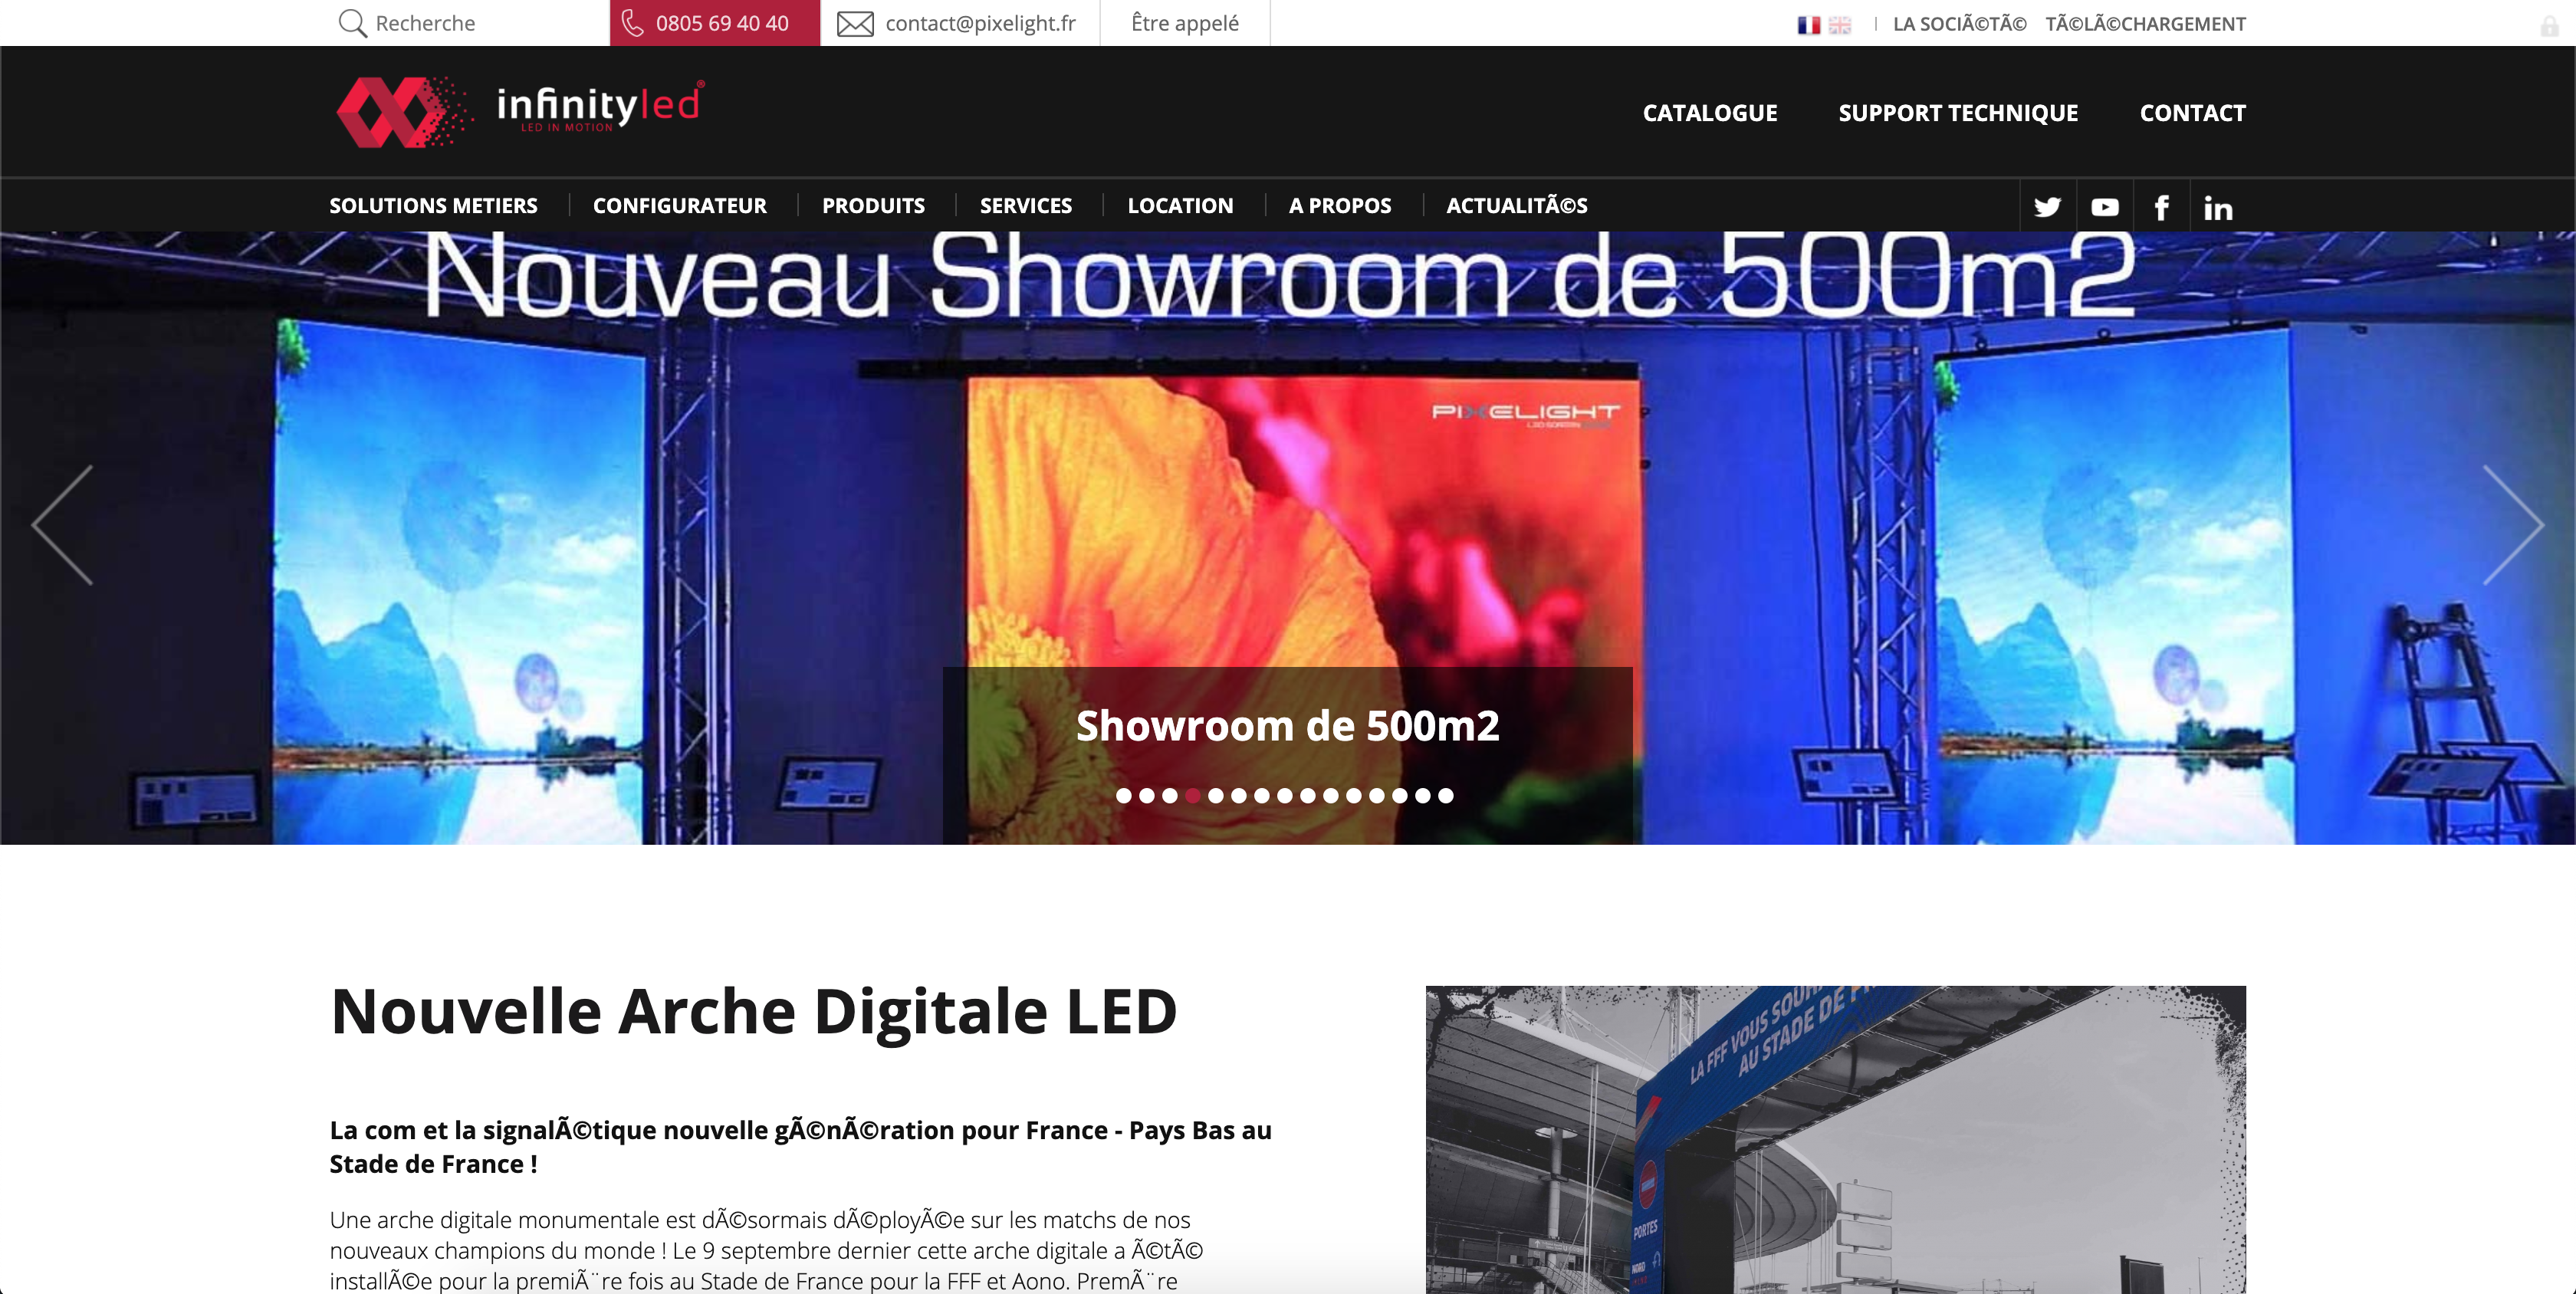 Image du site web Infinity-led.fr